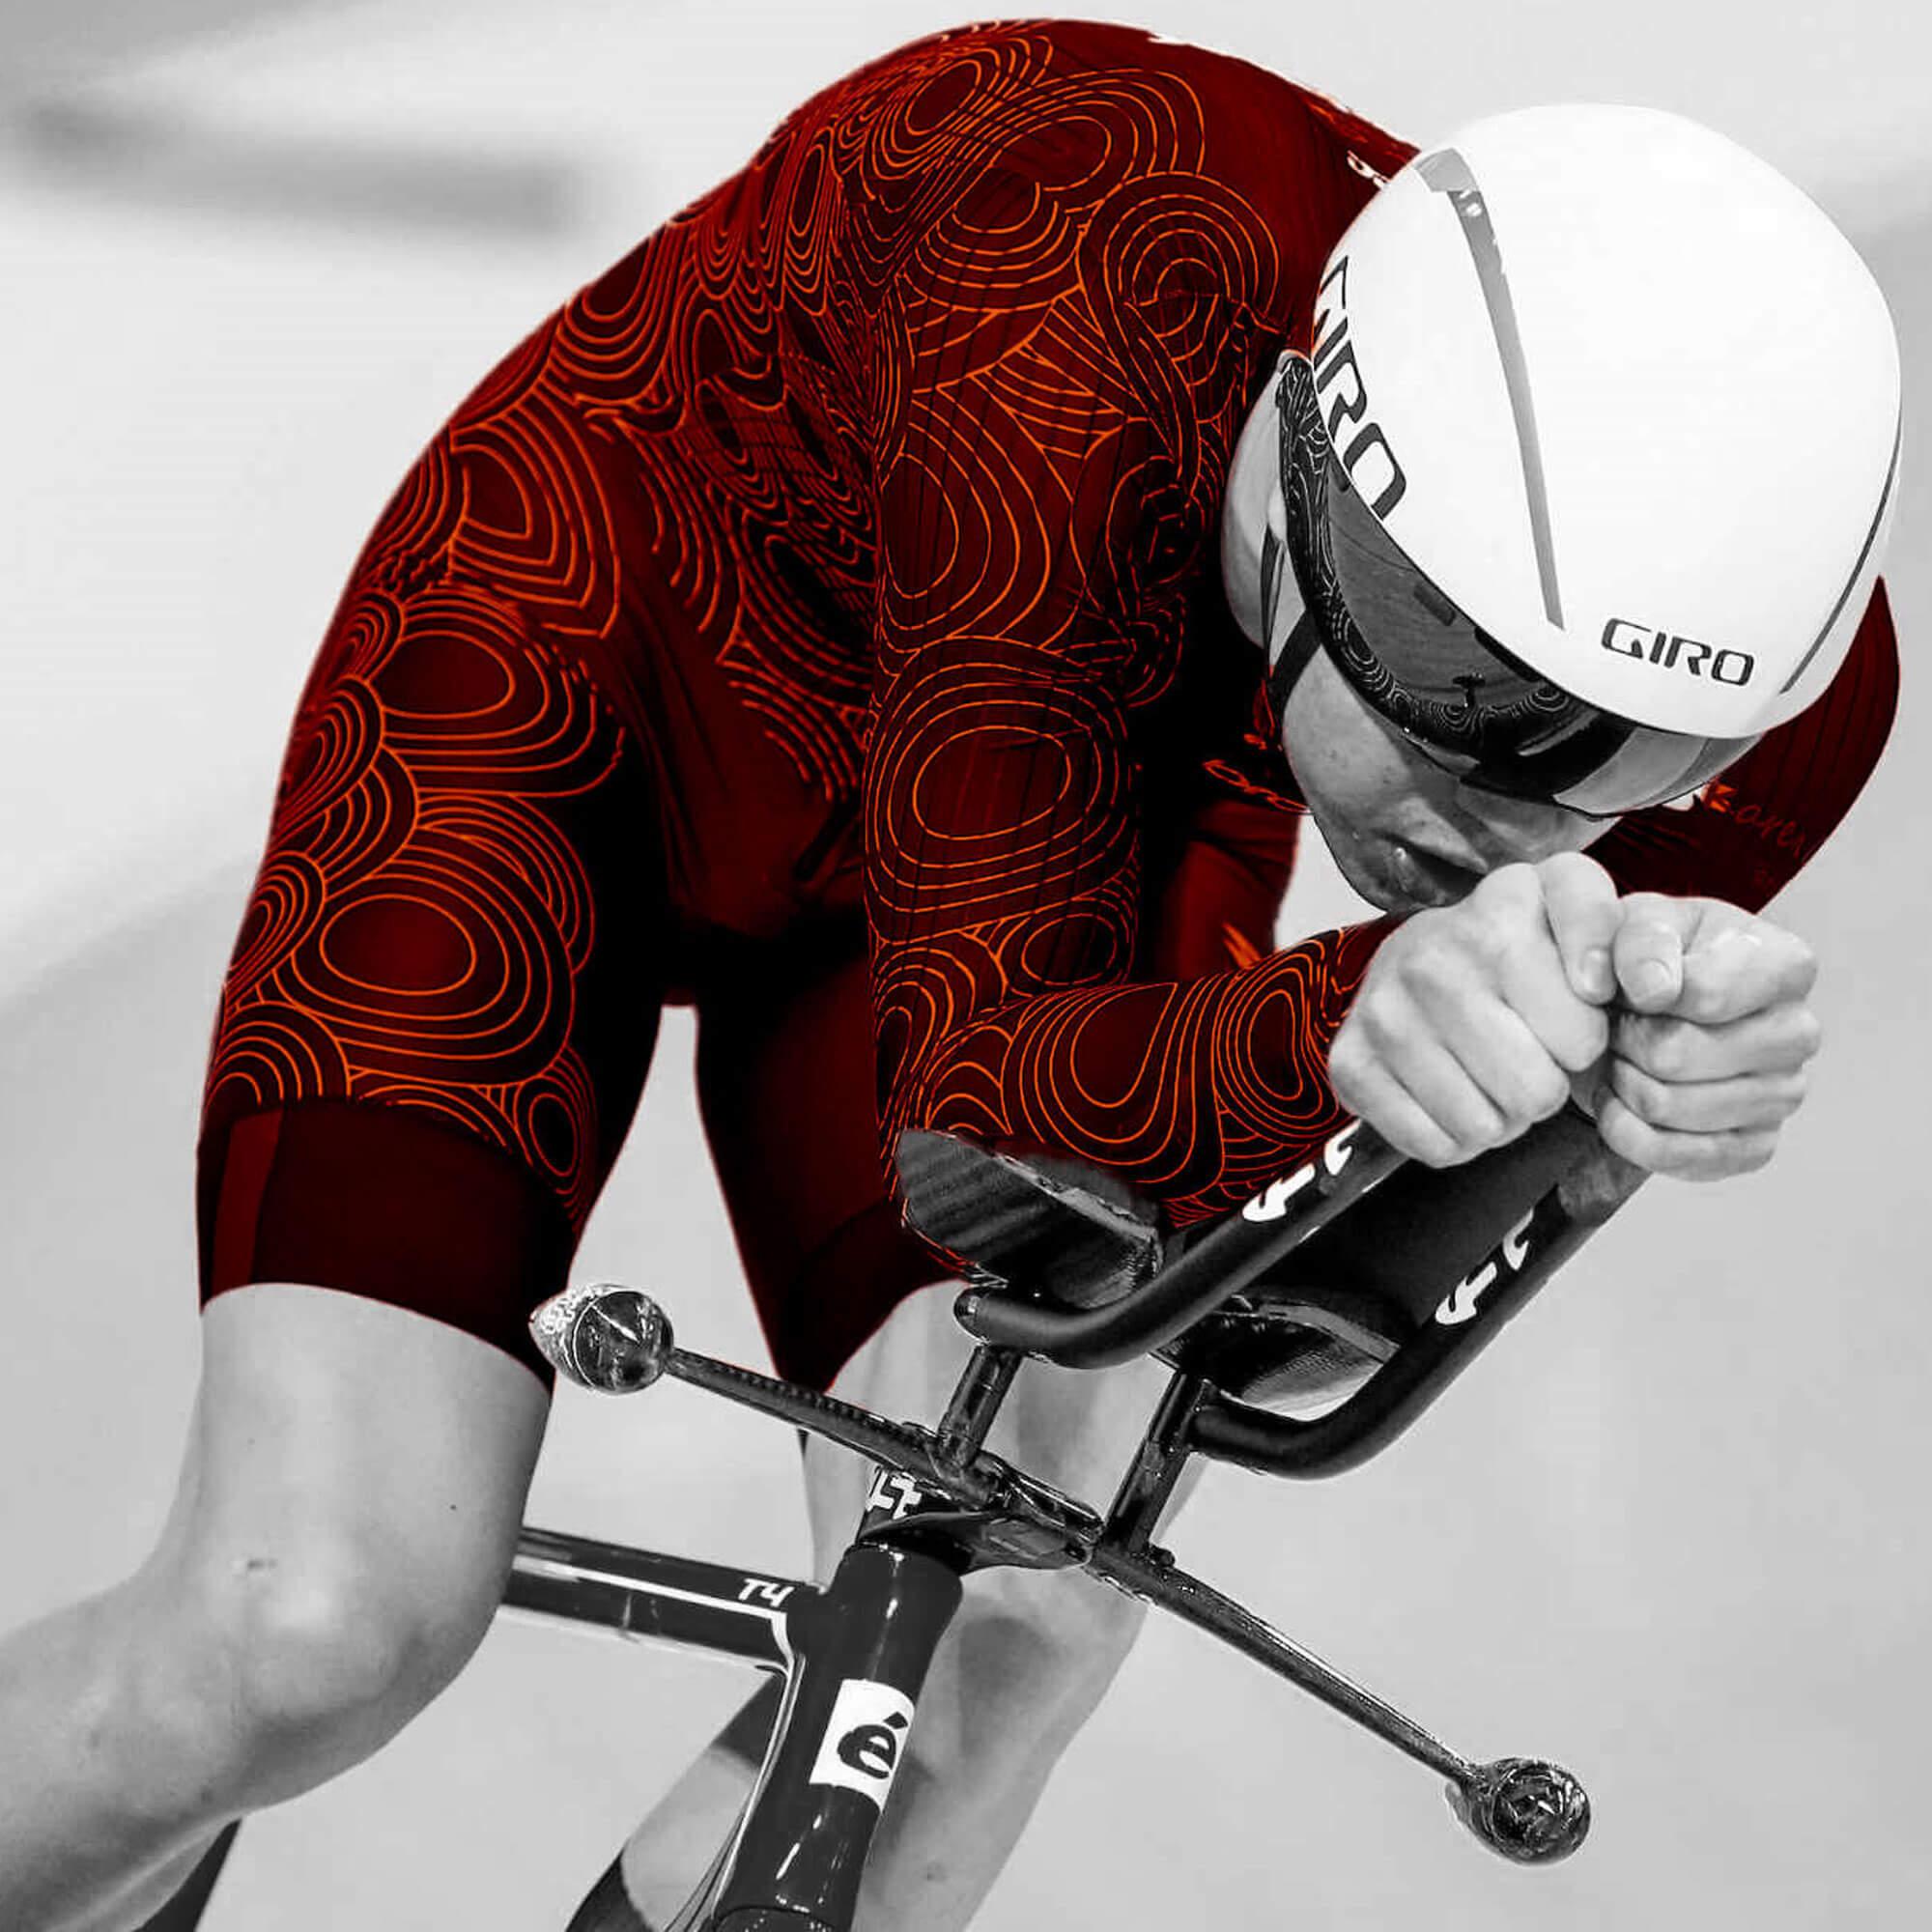 Velodrome track cyclist